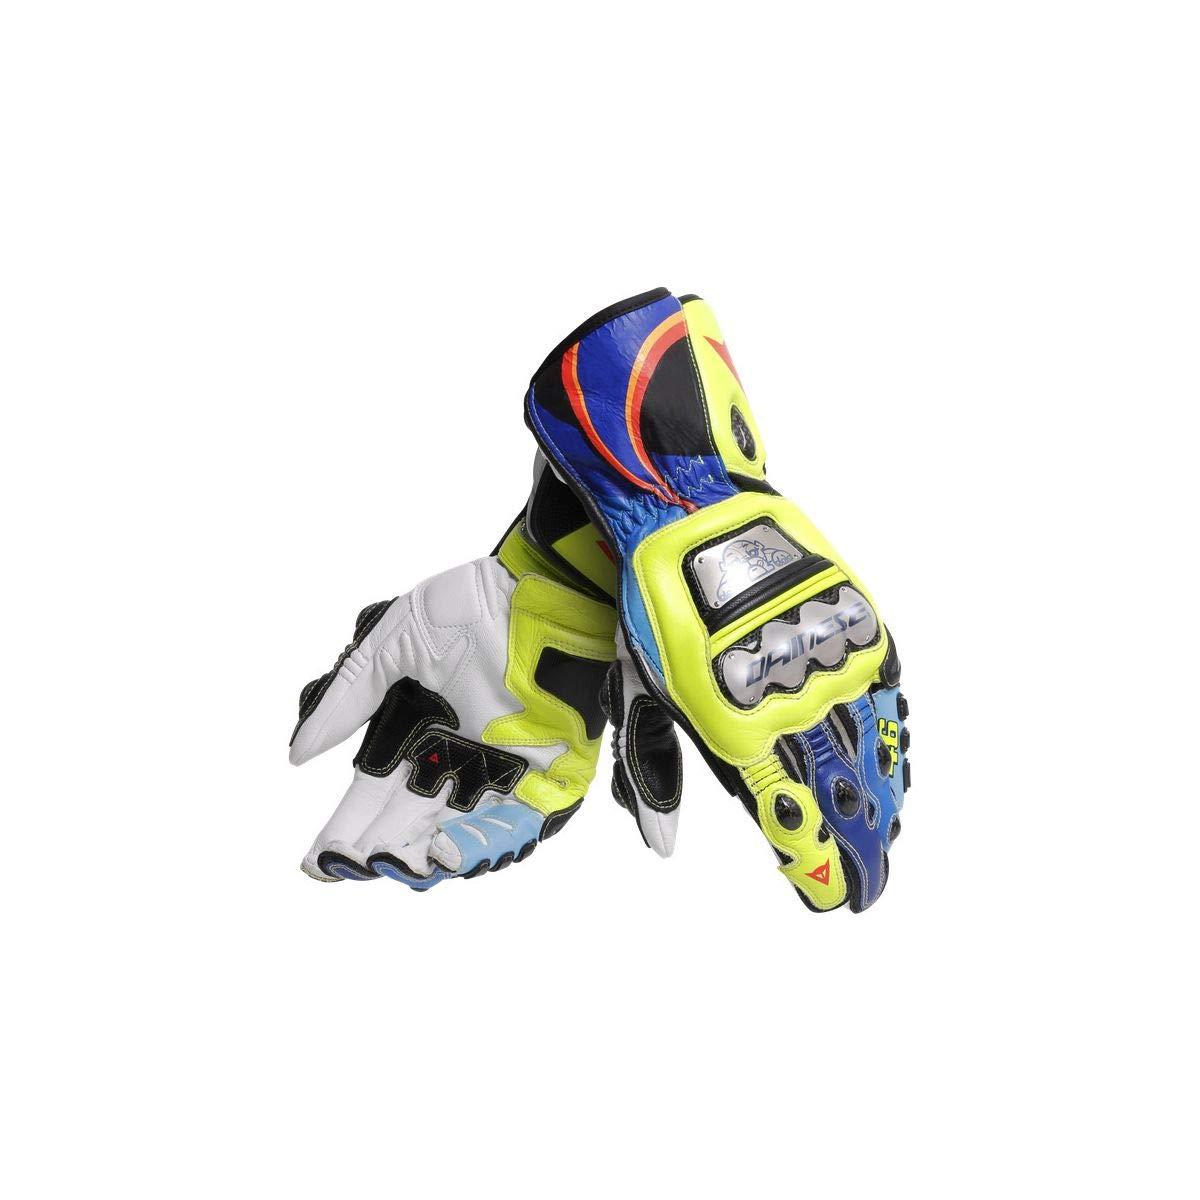 Dainese Full Metal 6 Replica Gloves (MEDIUM) (VR46)